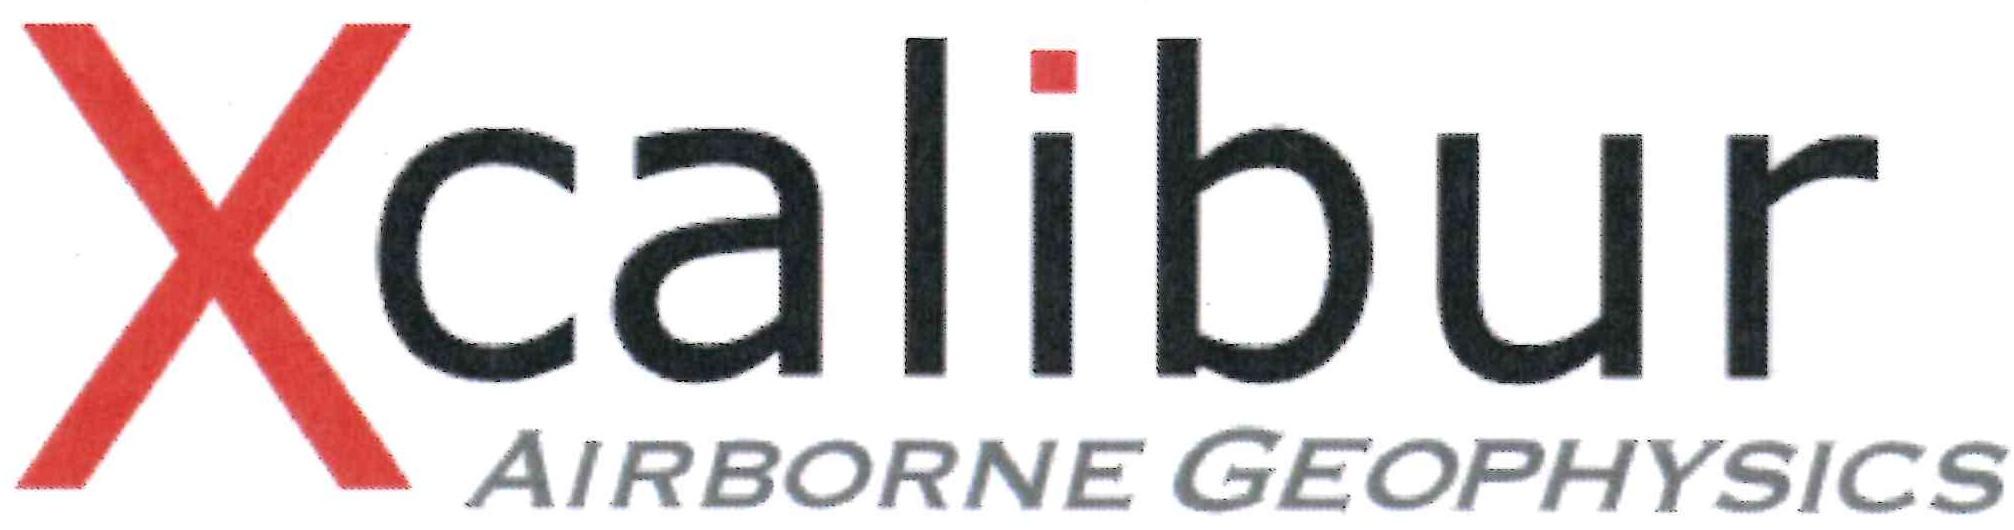 XCALIBUR AIRBORNE GEOPHYSICS